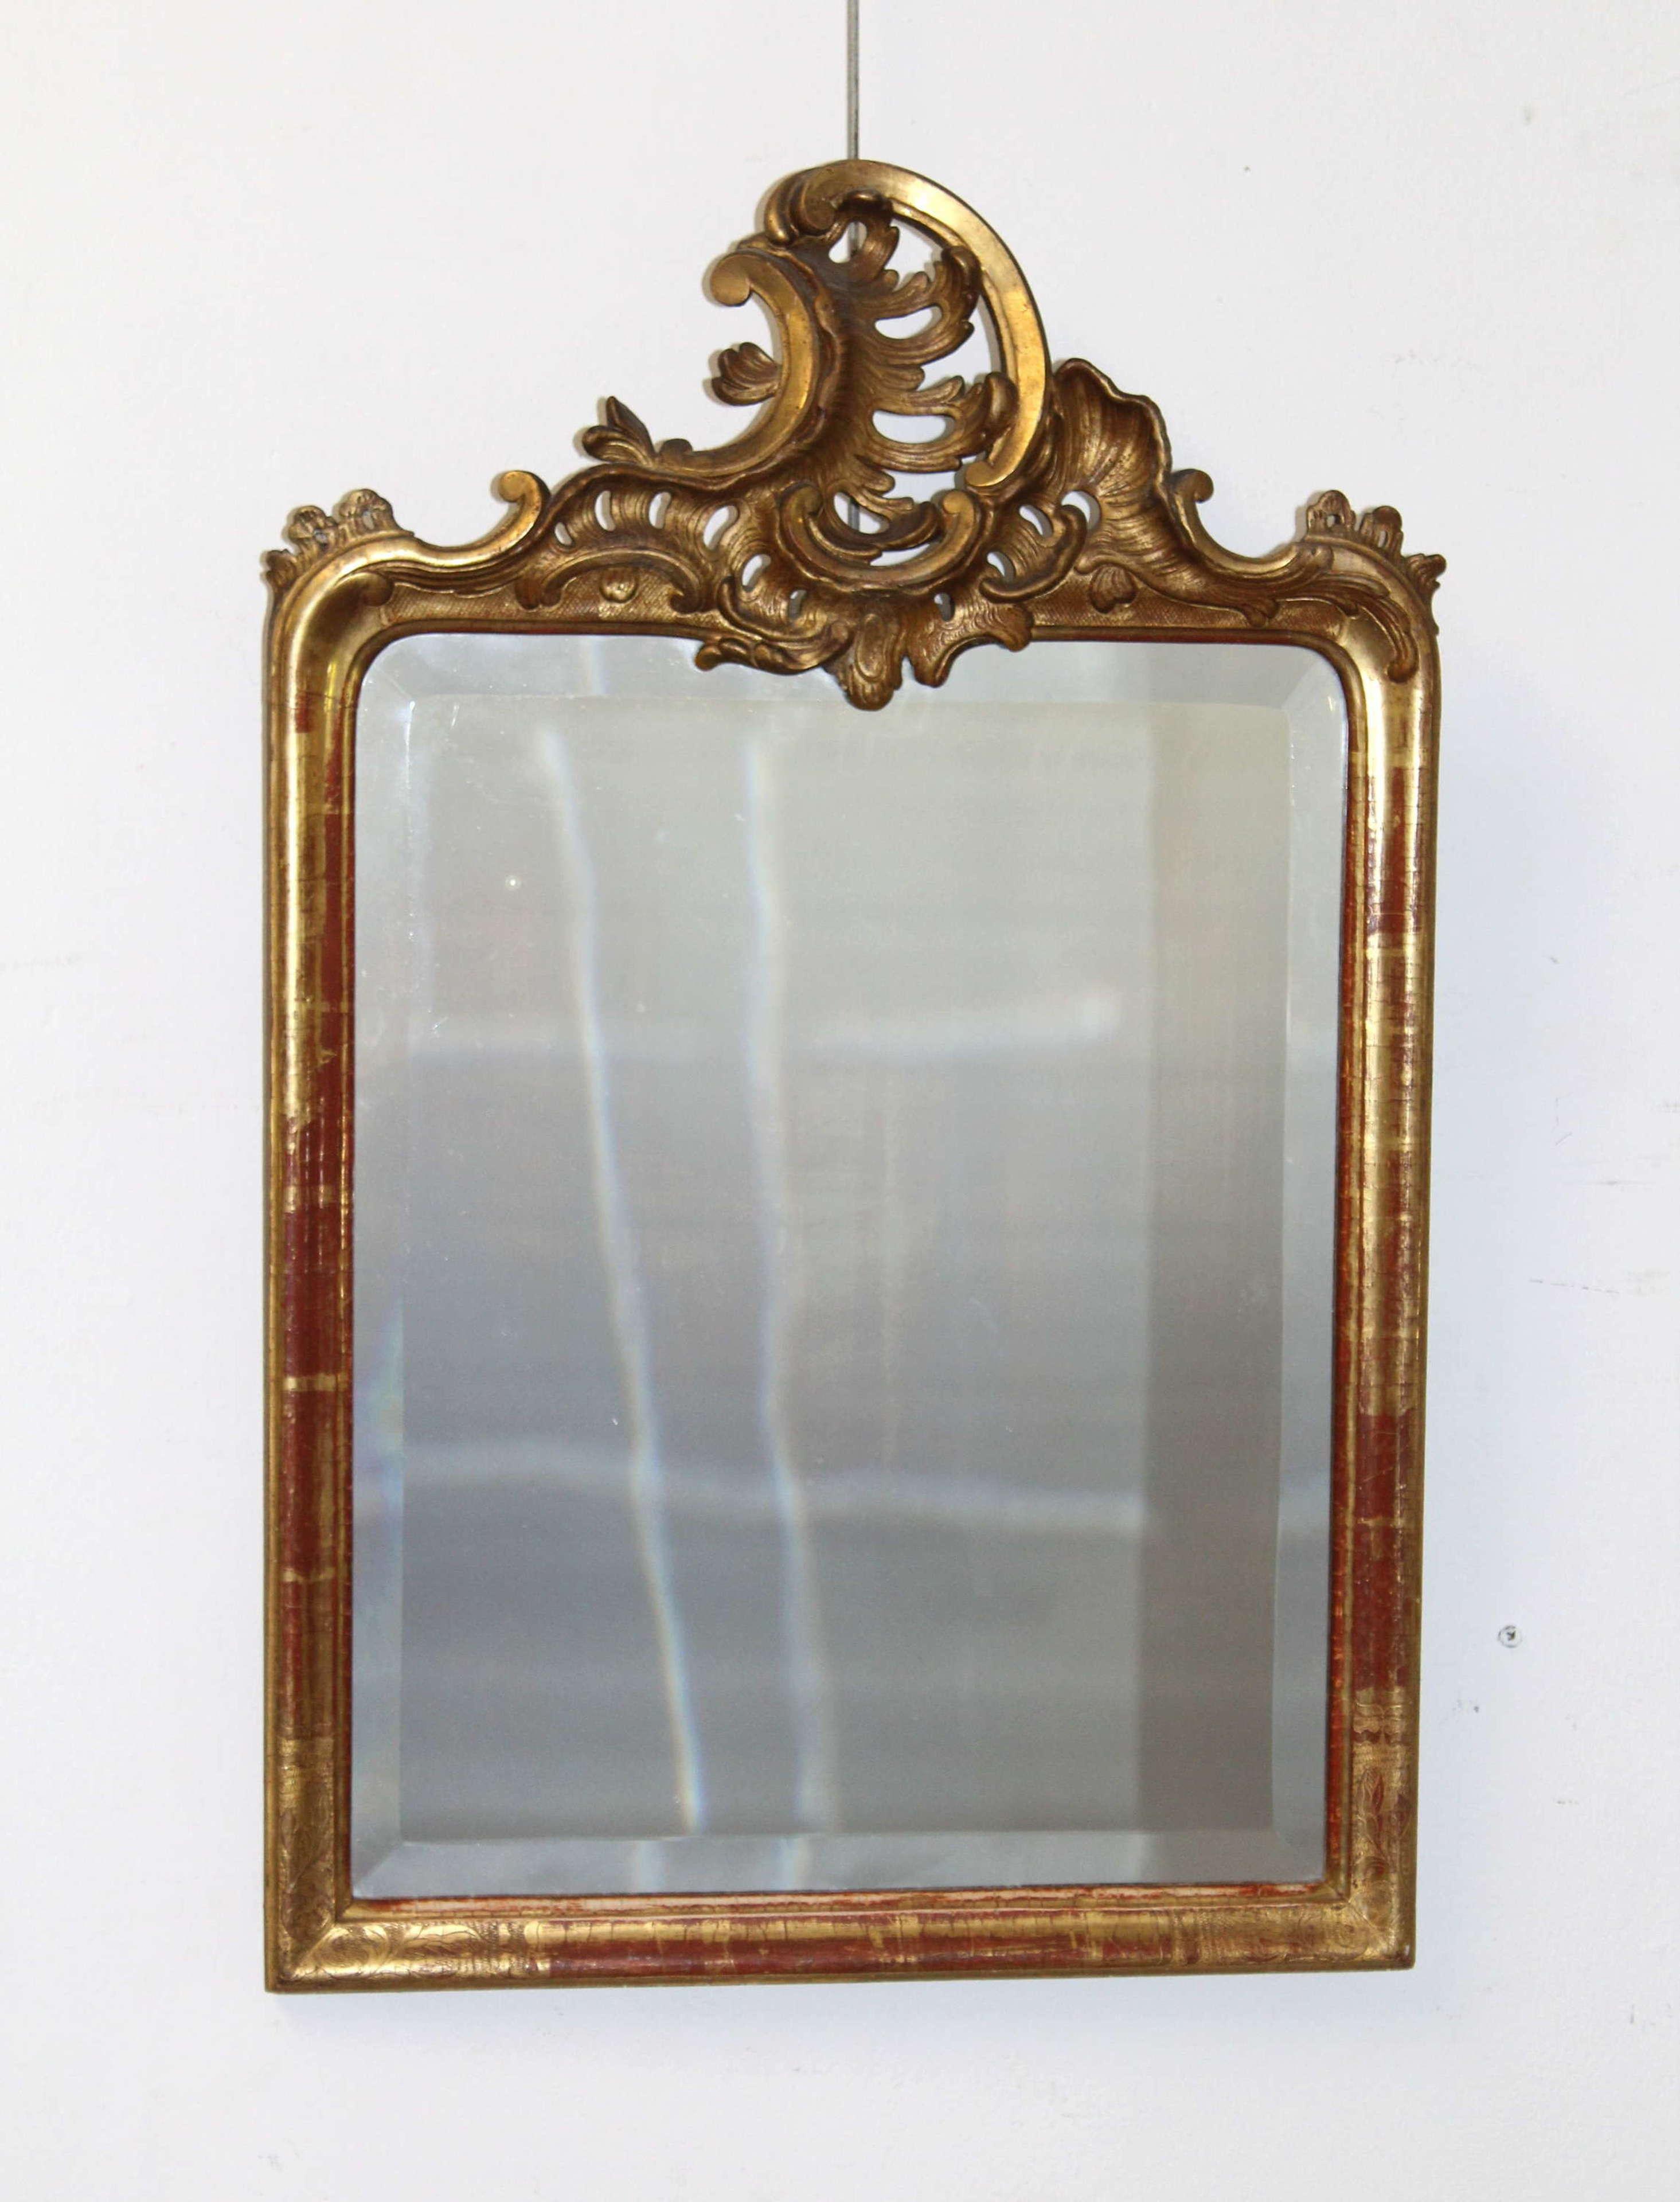 Small, decorative antique mirror with acanthus crest